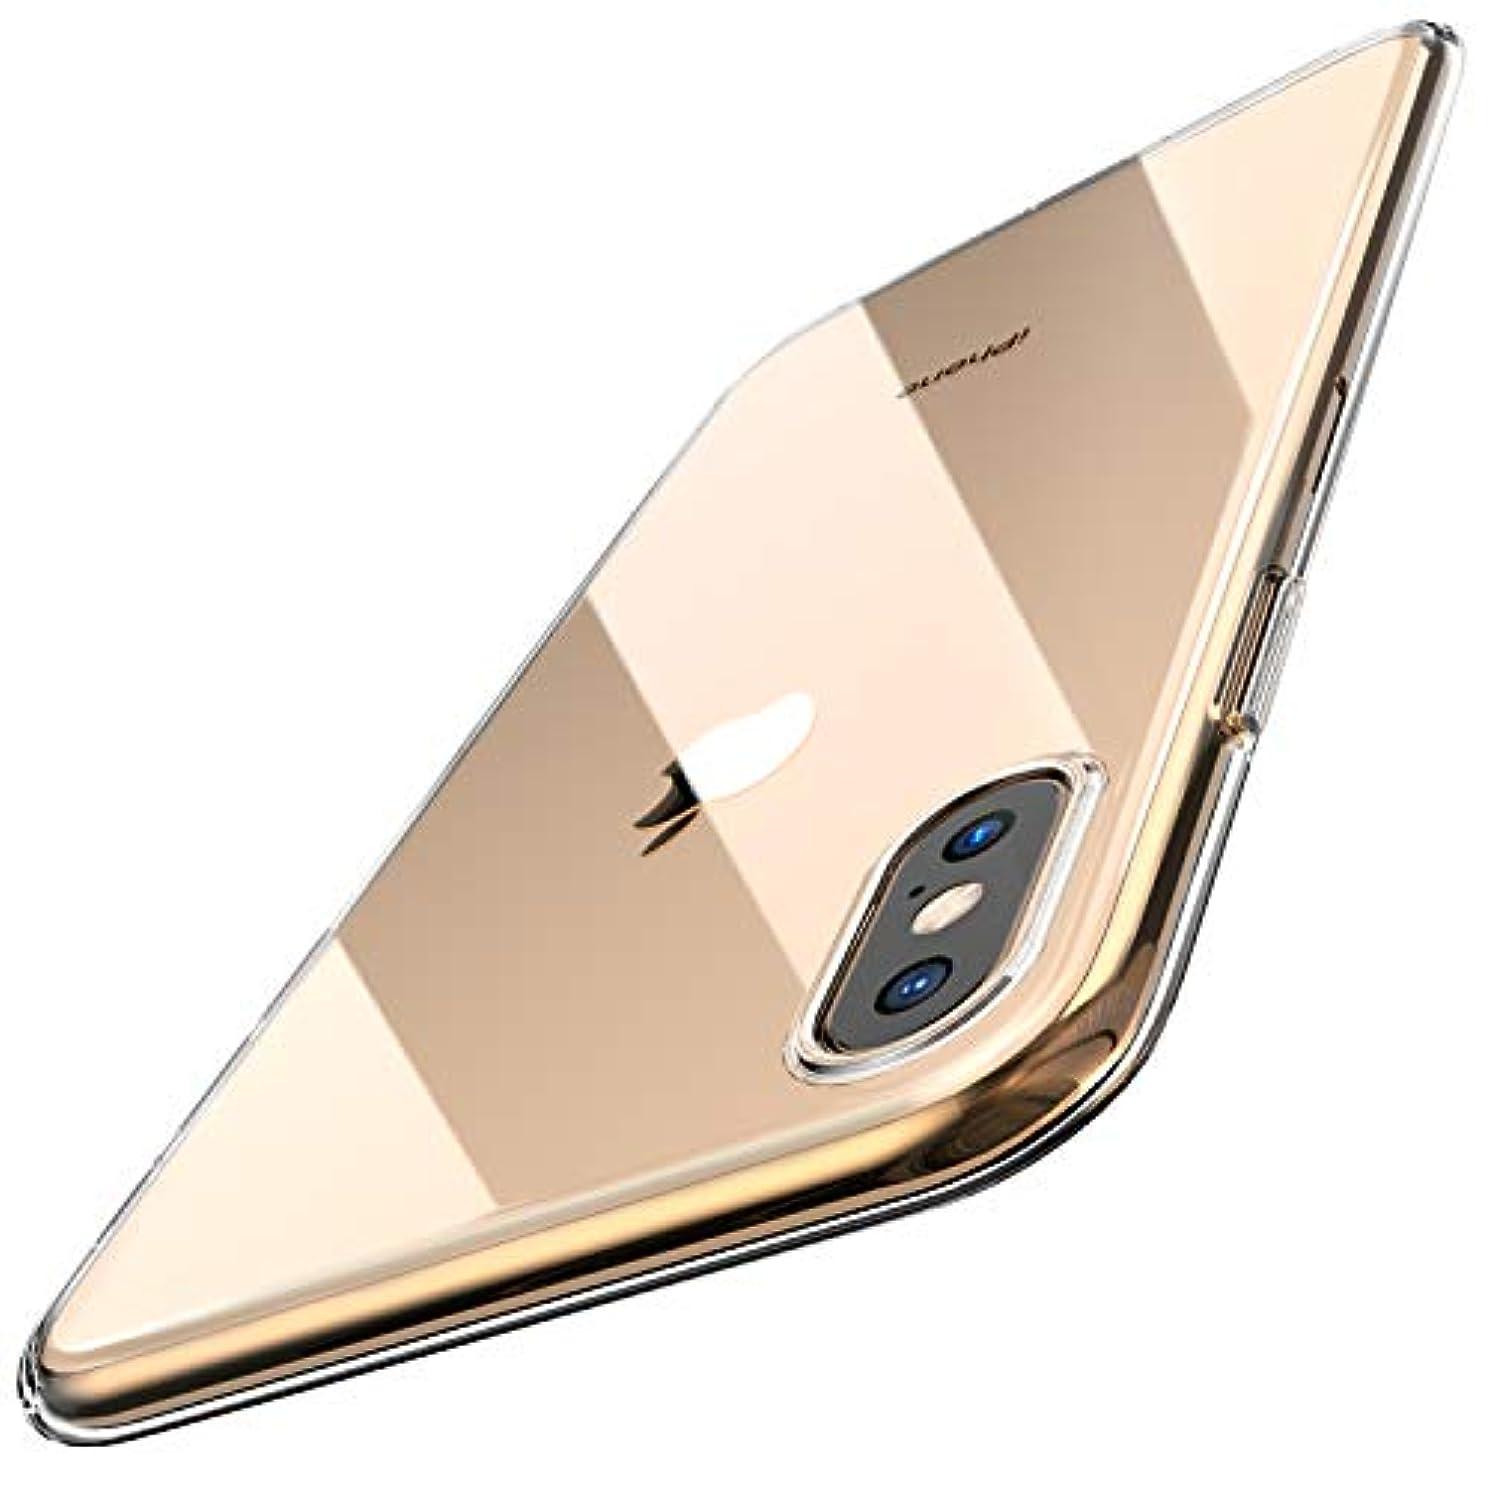 TOZO for iPhone Xs Max Case 6.5 Inch (2018) Premium Clear Soft TPU Gel Ultra-Thin [Slim Fit] Transparent Flexible Cover for iPhone Xs Max [Clear Gel]